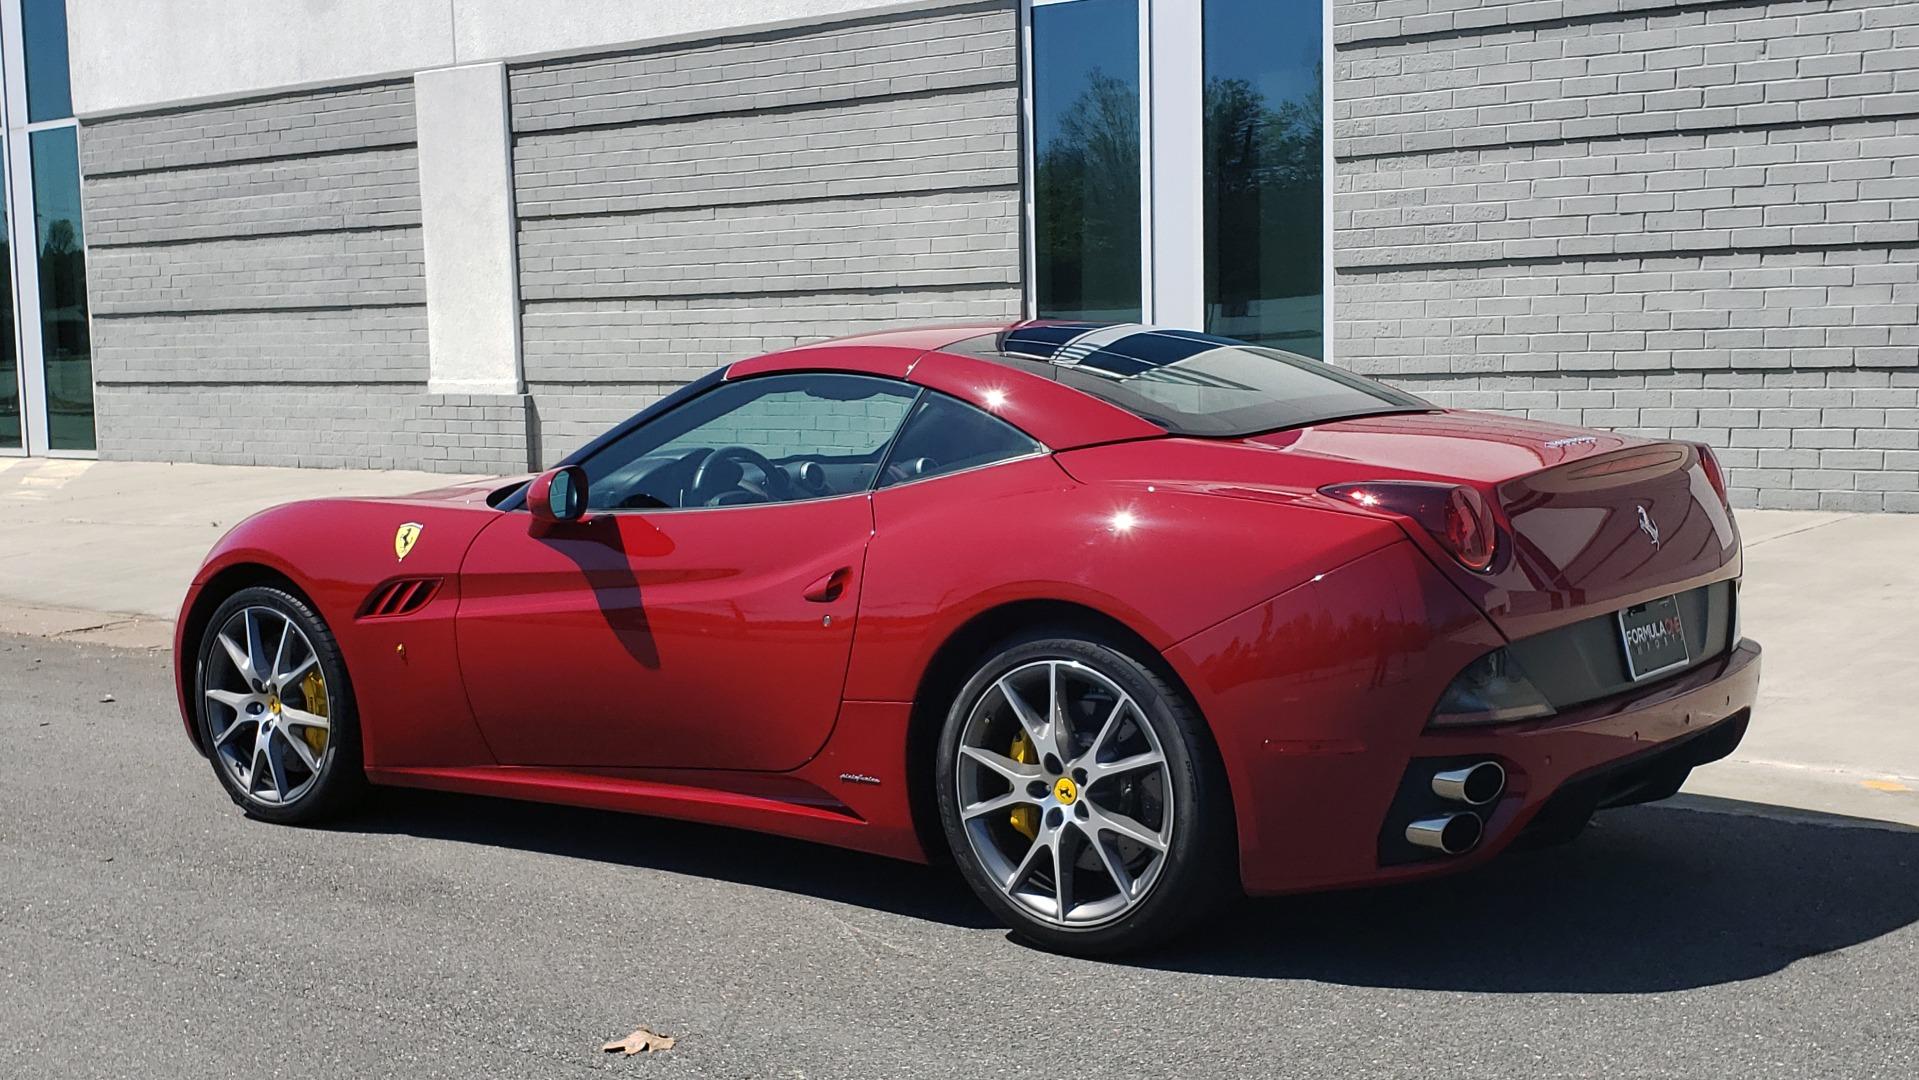 Used 2014 Ferrari CALIFORNIA CONVERTIBLE 2+2 / NAV / PARK SENS / CAMERA / TPMS for sale Sold at Formula Imports in Charlotte NC 28227 8